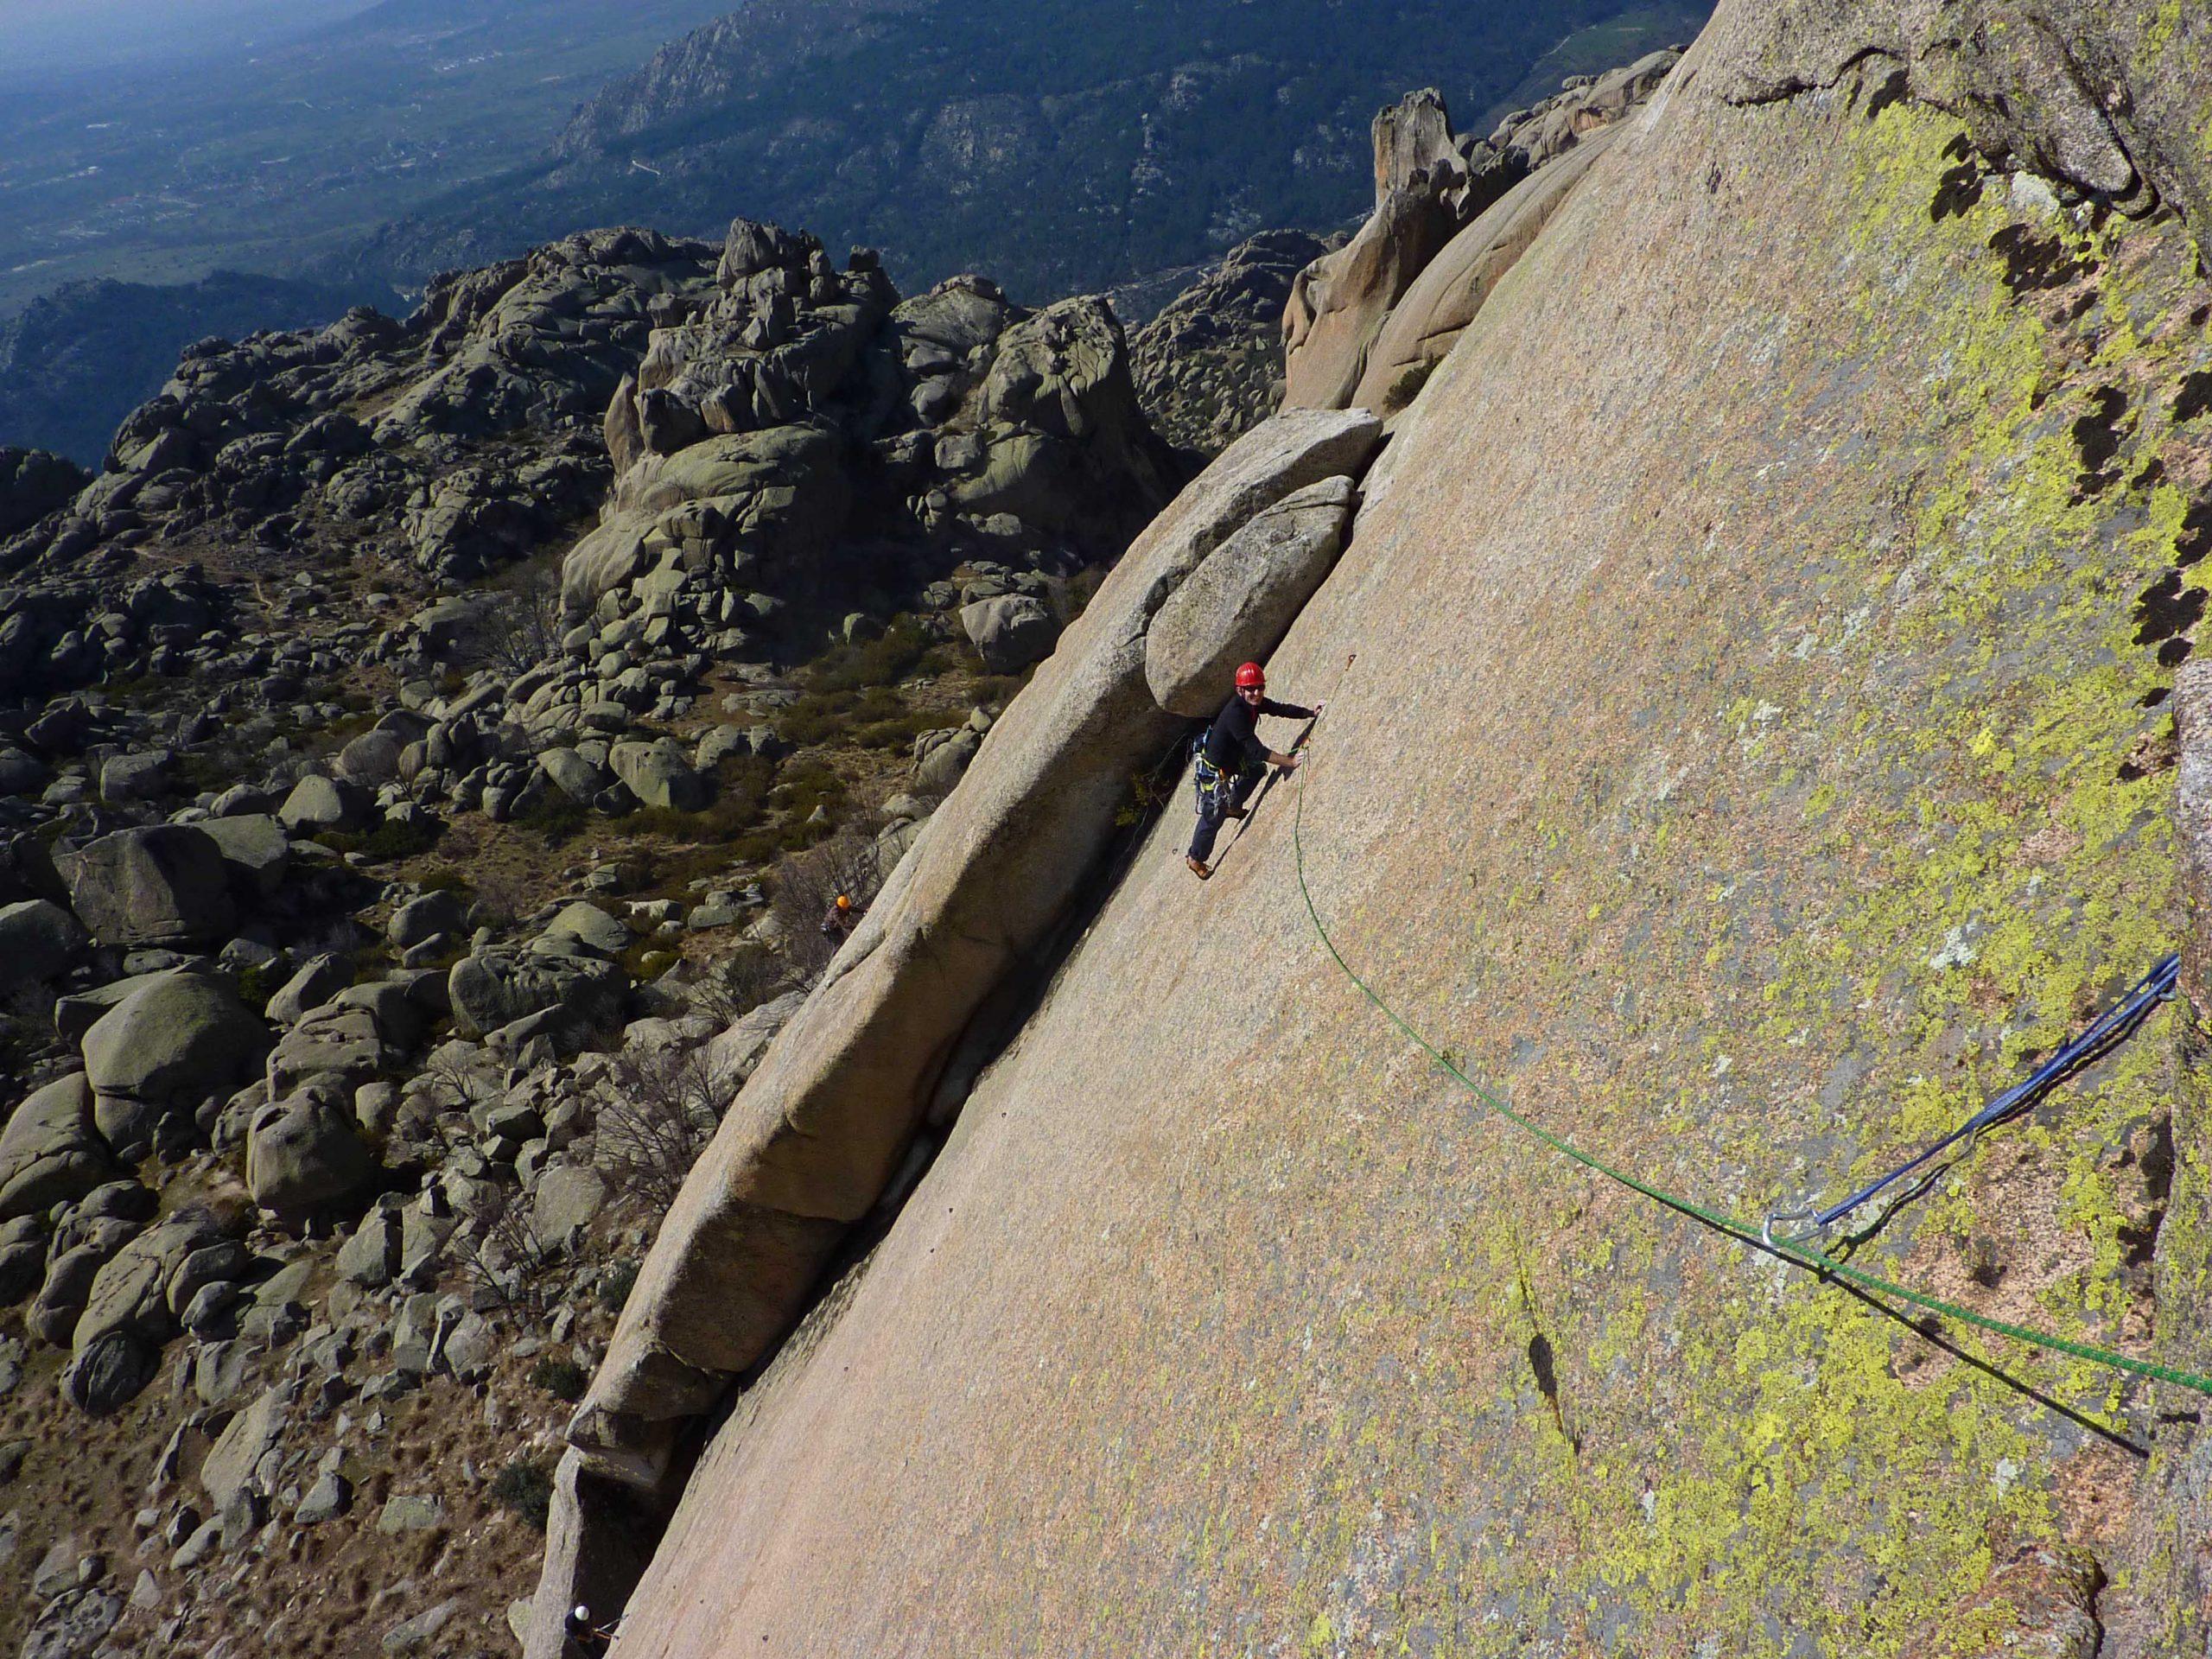 Curso de escalada en roca, nivel 2 (vías de varios largos equipadas). Madrid